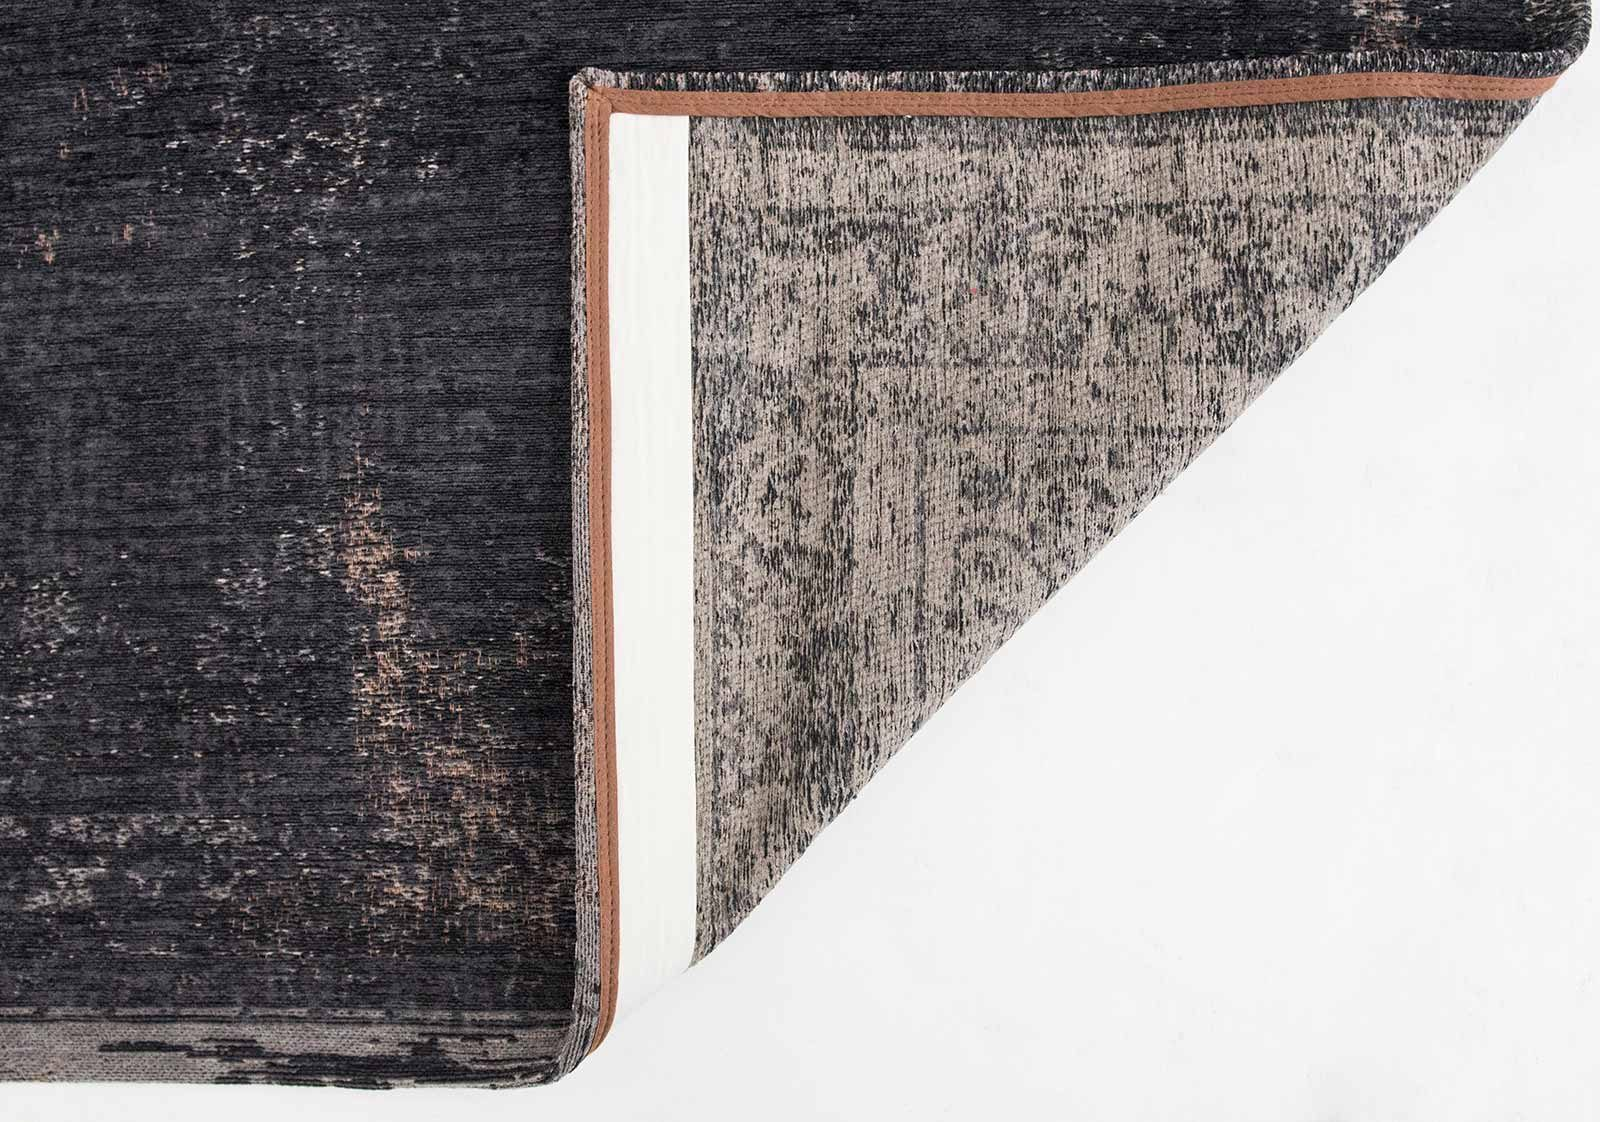 alfombras Louis De Poortere LX8263 Fading World Medaillon Mineral Black back